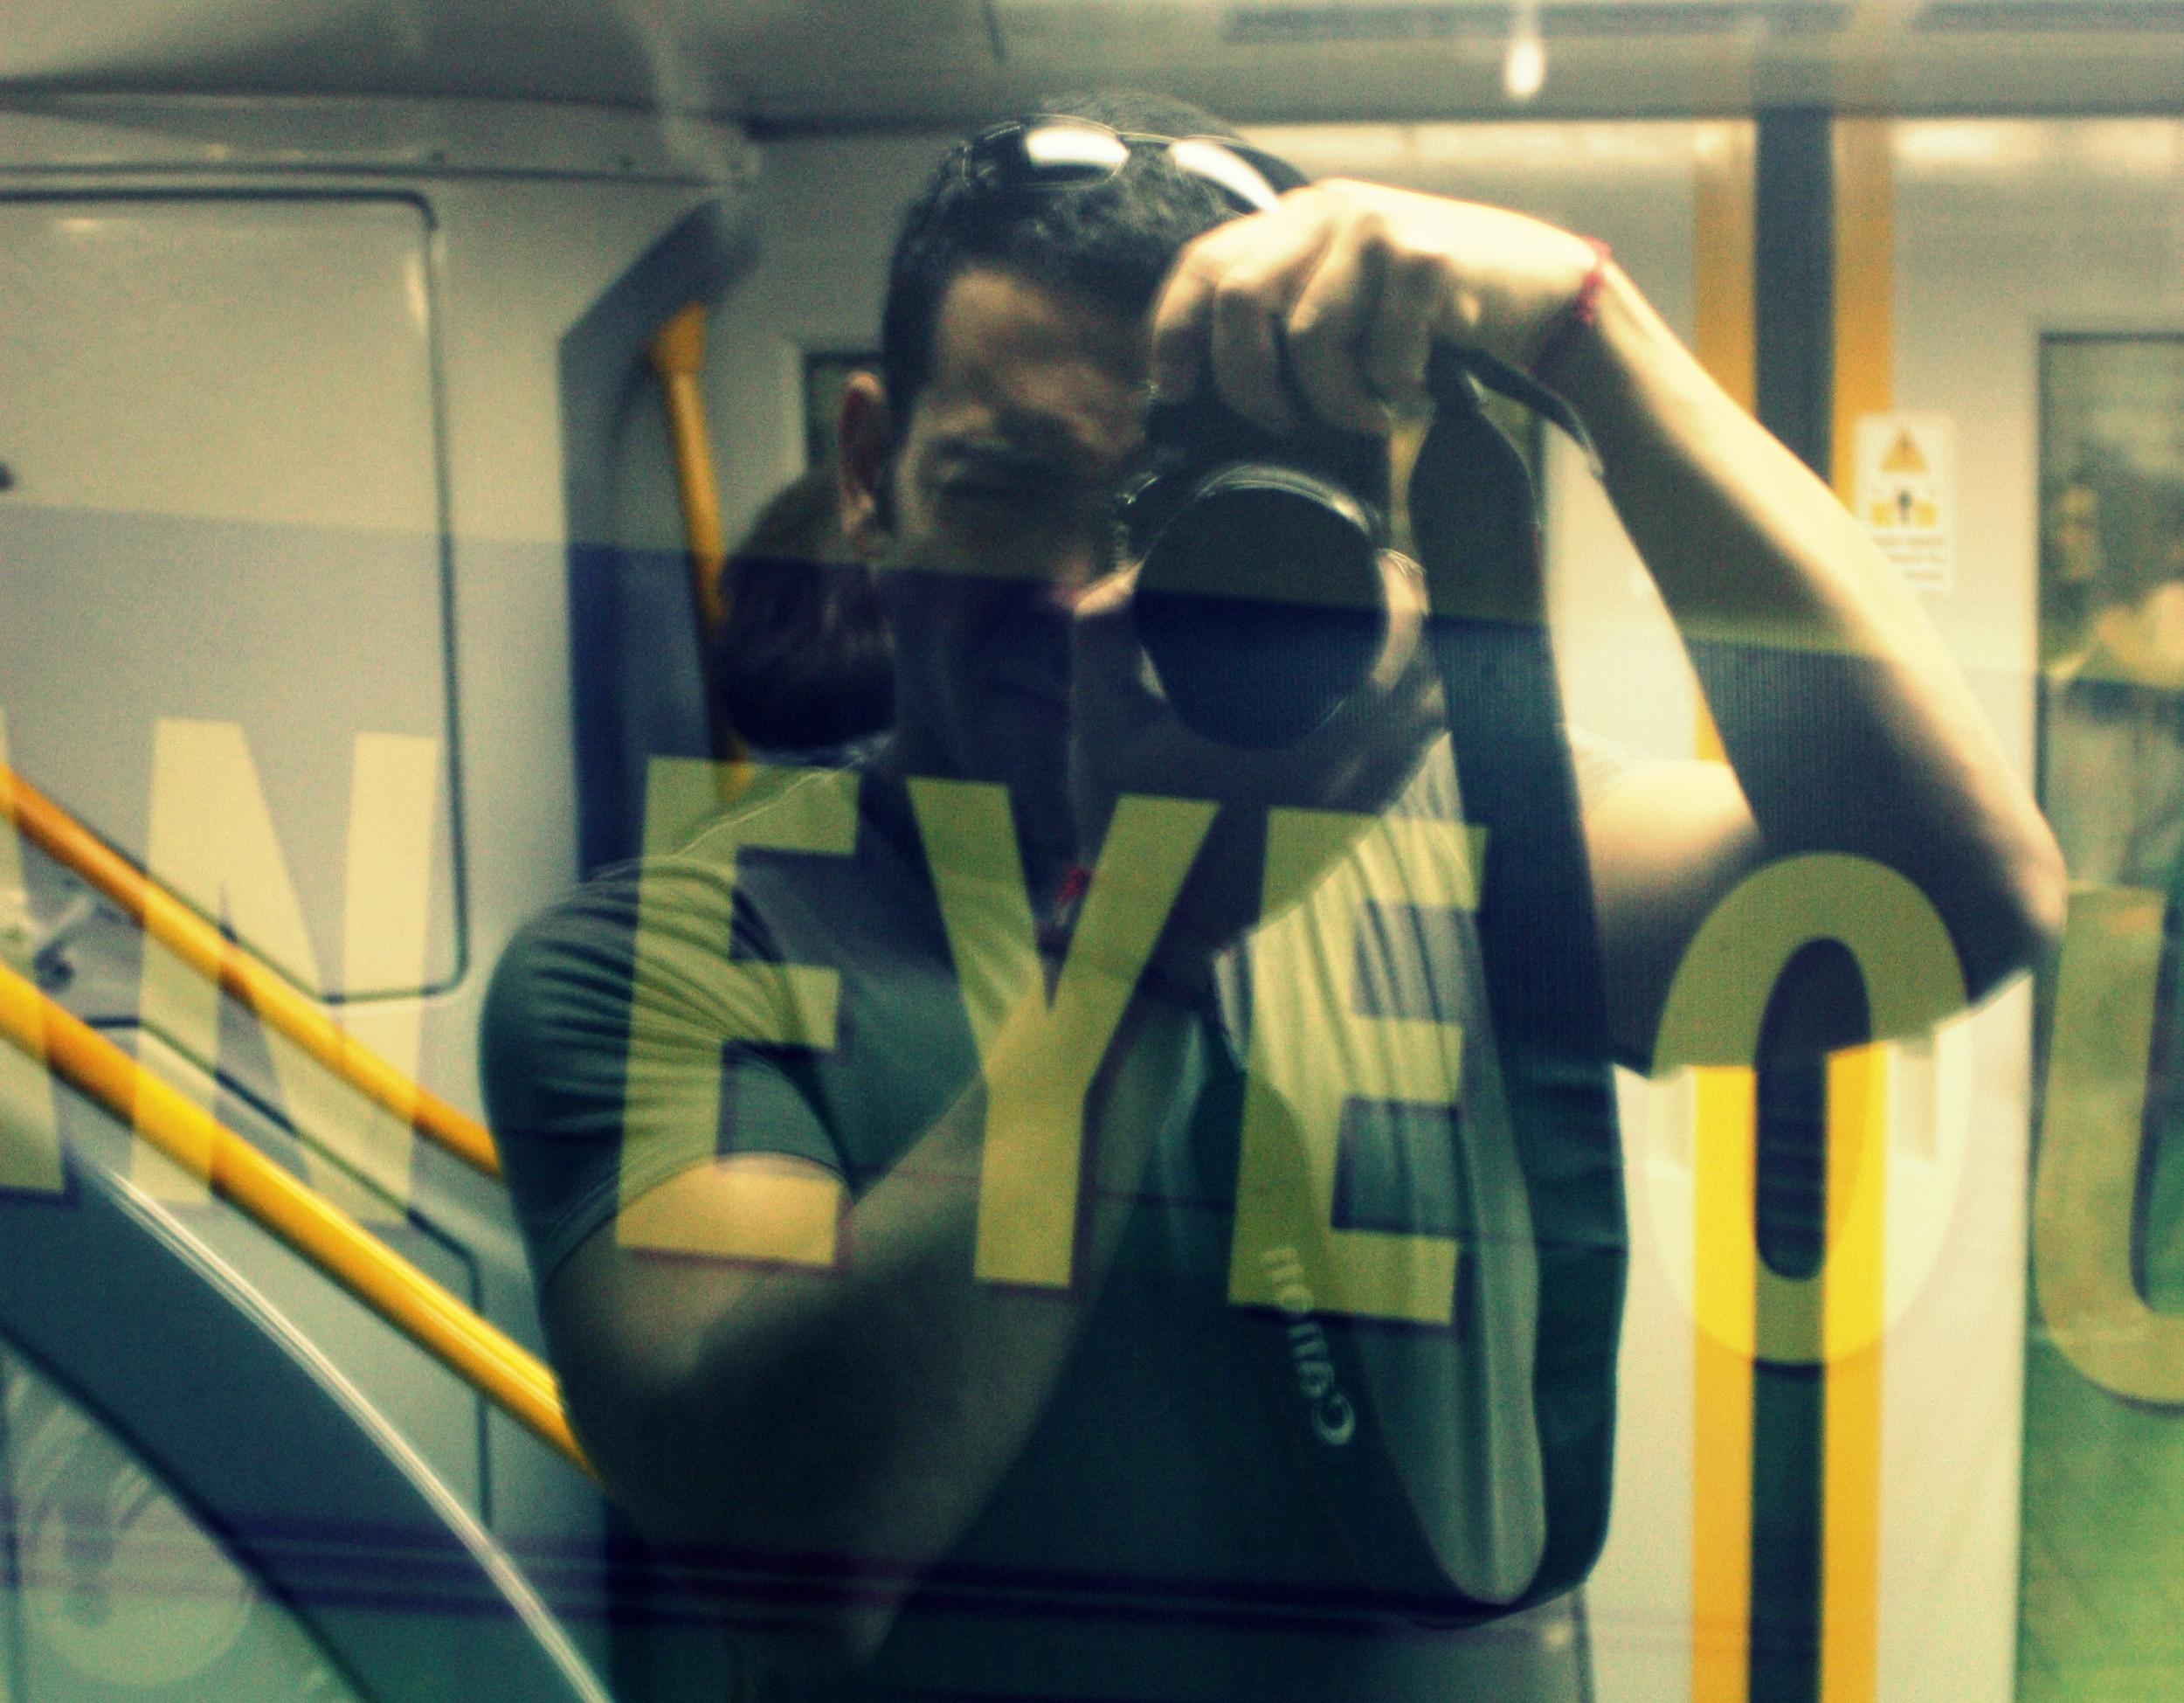 Self-photo (2012)